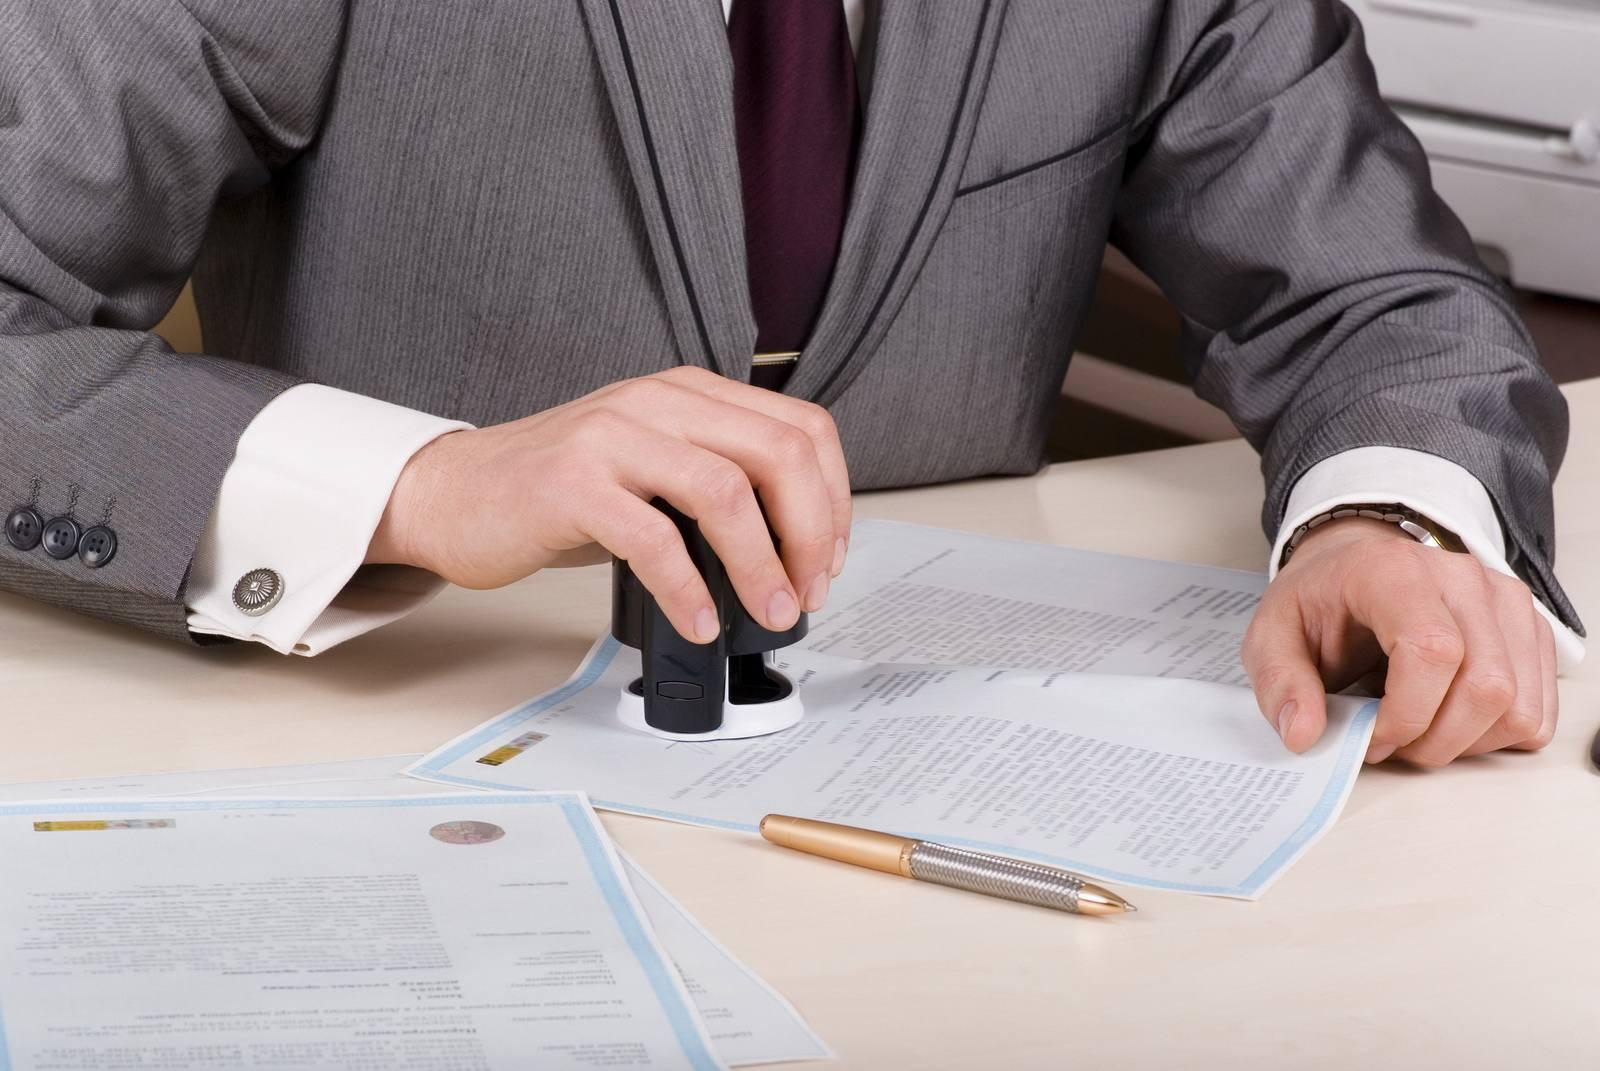 Минимальная оплата за услуги нотариусов в Украине отменена